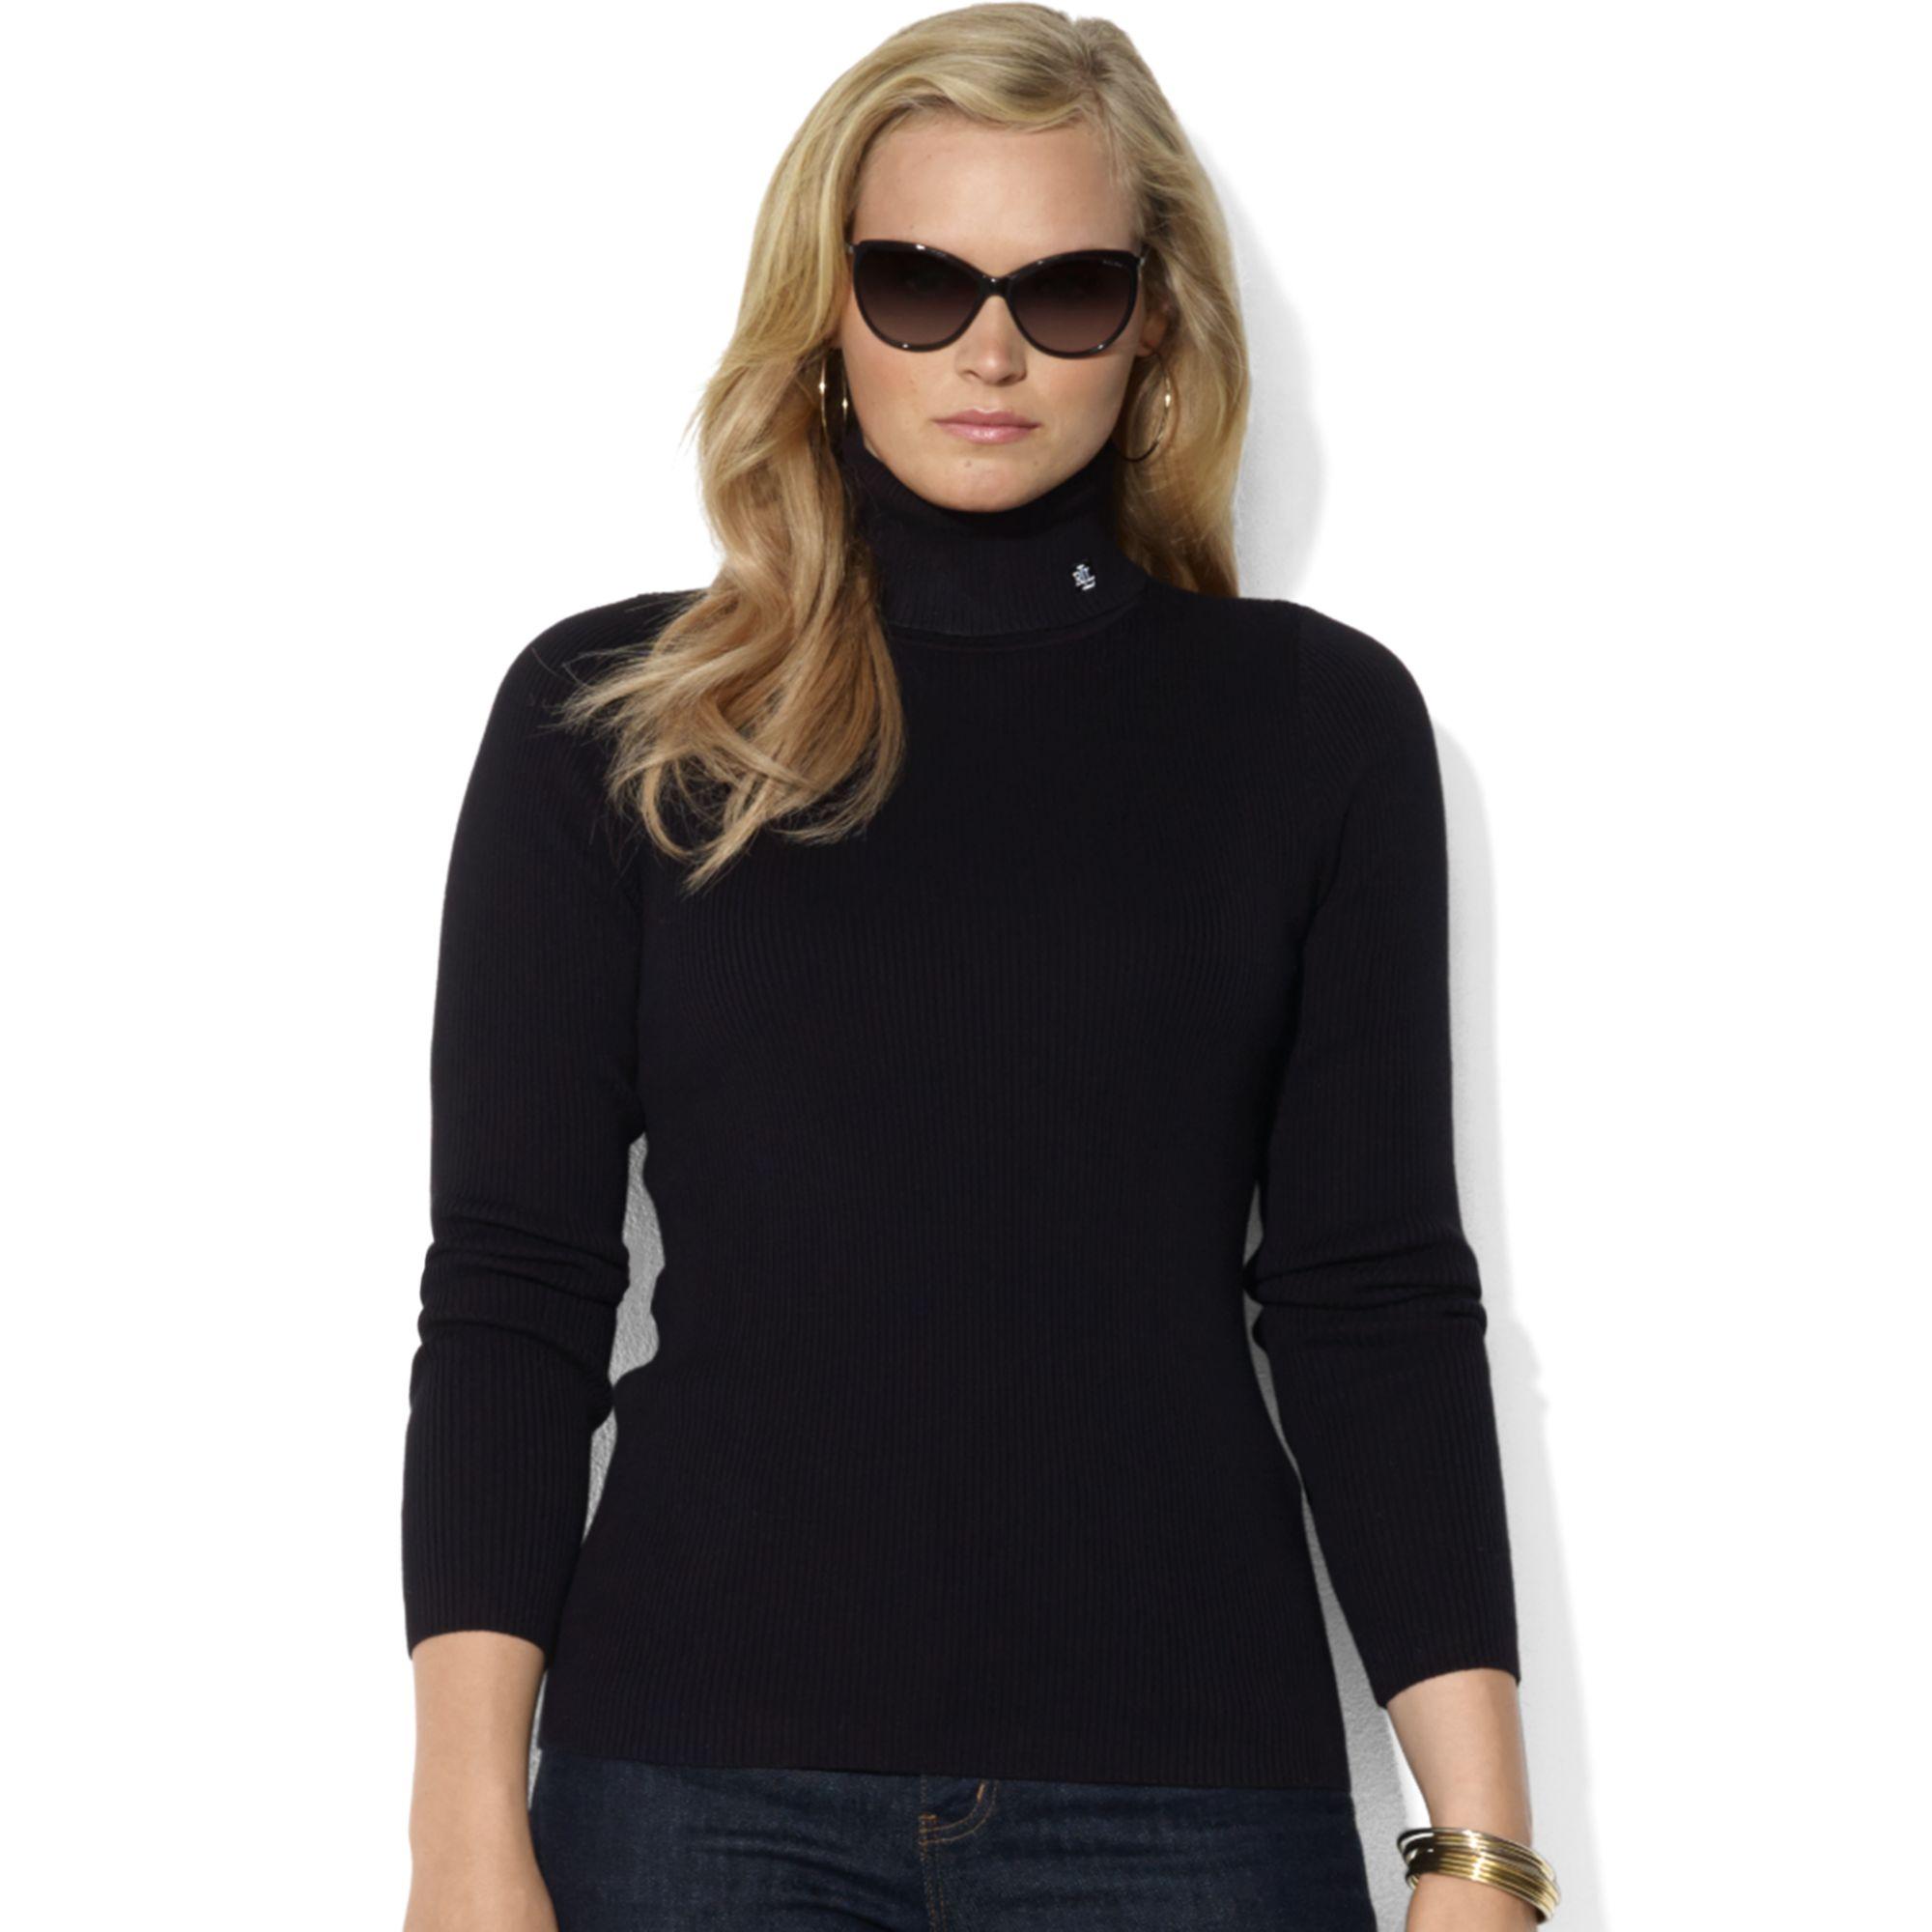 macys plus size sweater dresses photo - 1